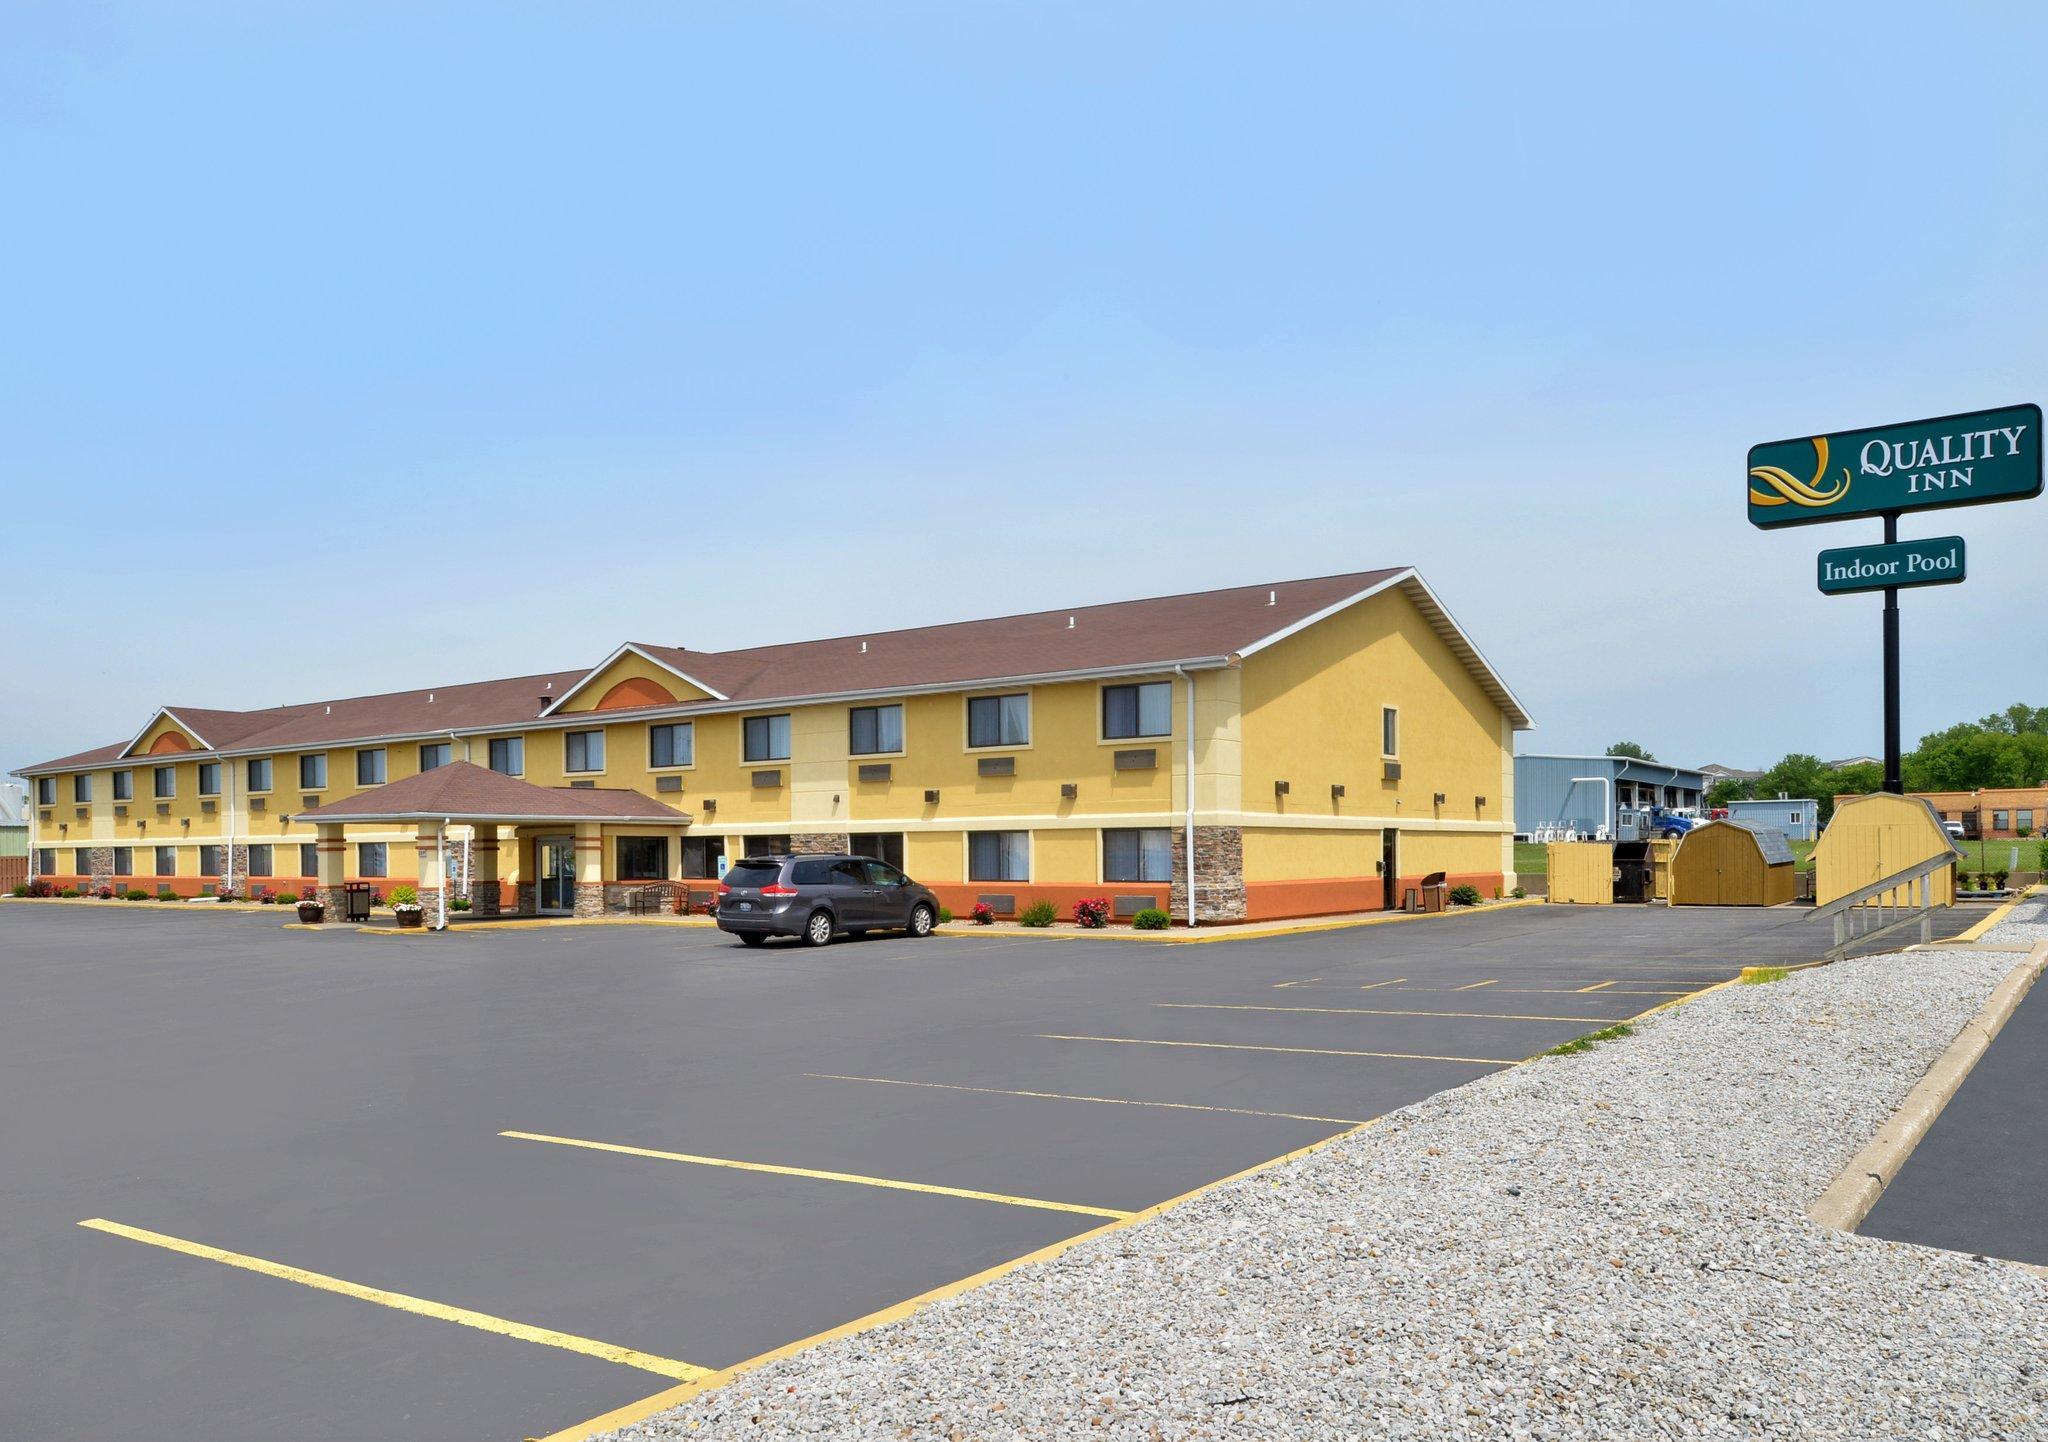 Quality Inn Coralville